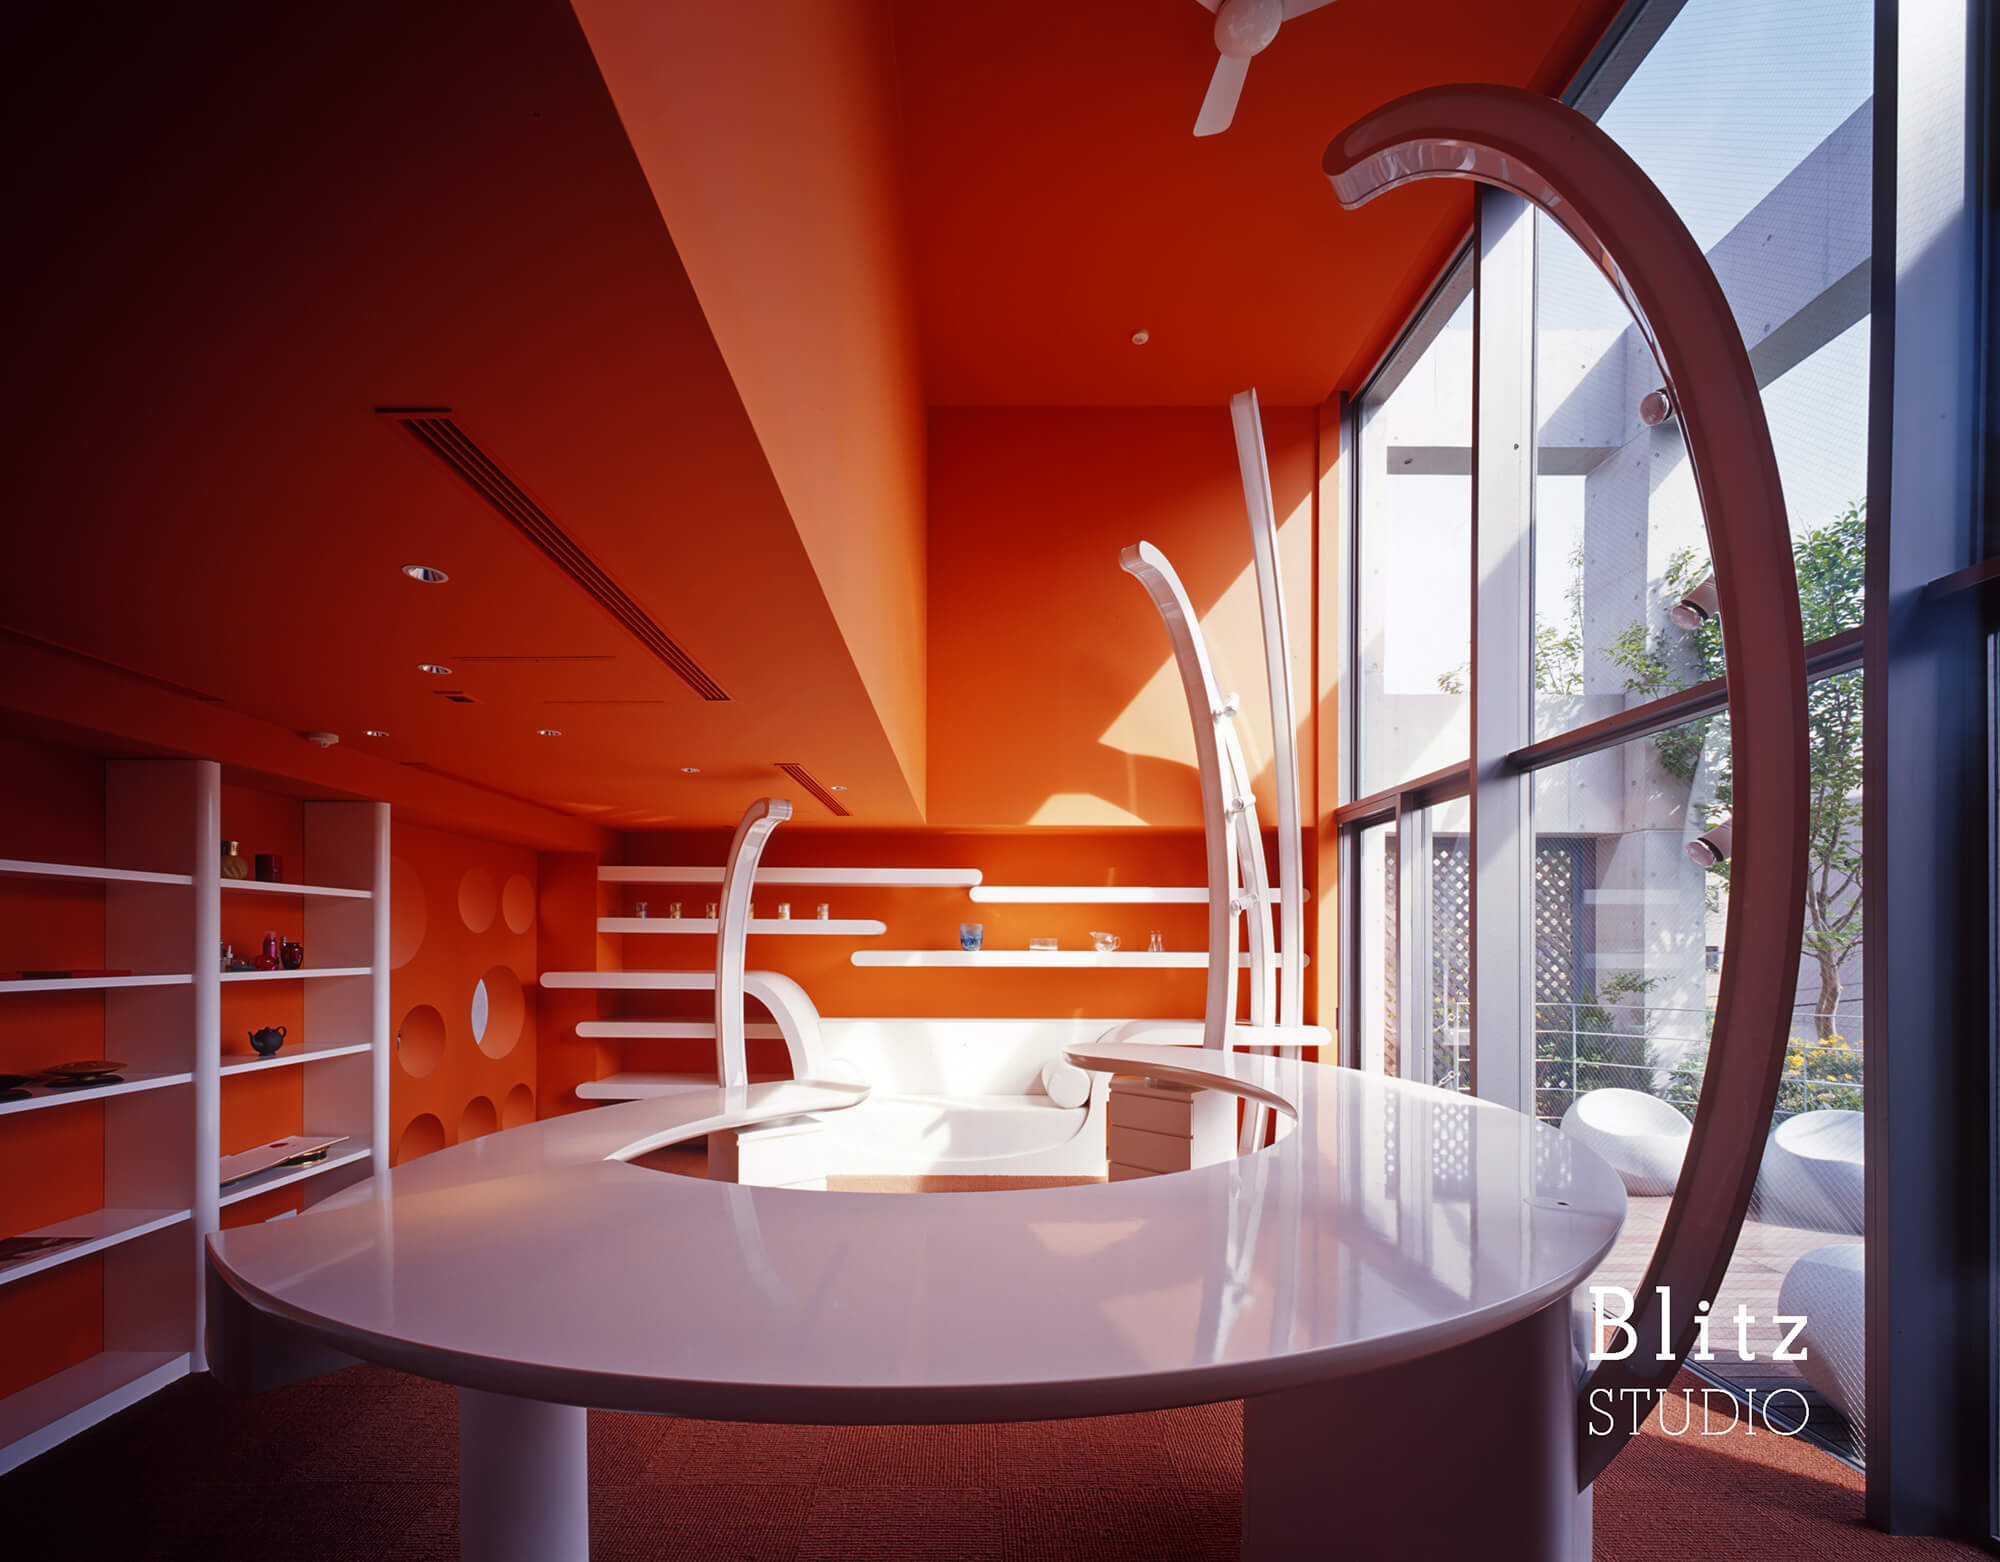 『shu uemura aoyama atelier シュウ ウエムラ青山アトリエ』-東京都-建築写真・竣工写真・インテリア写真2